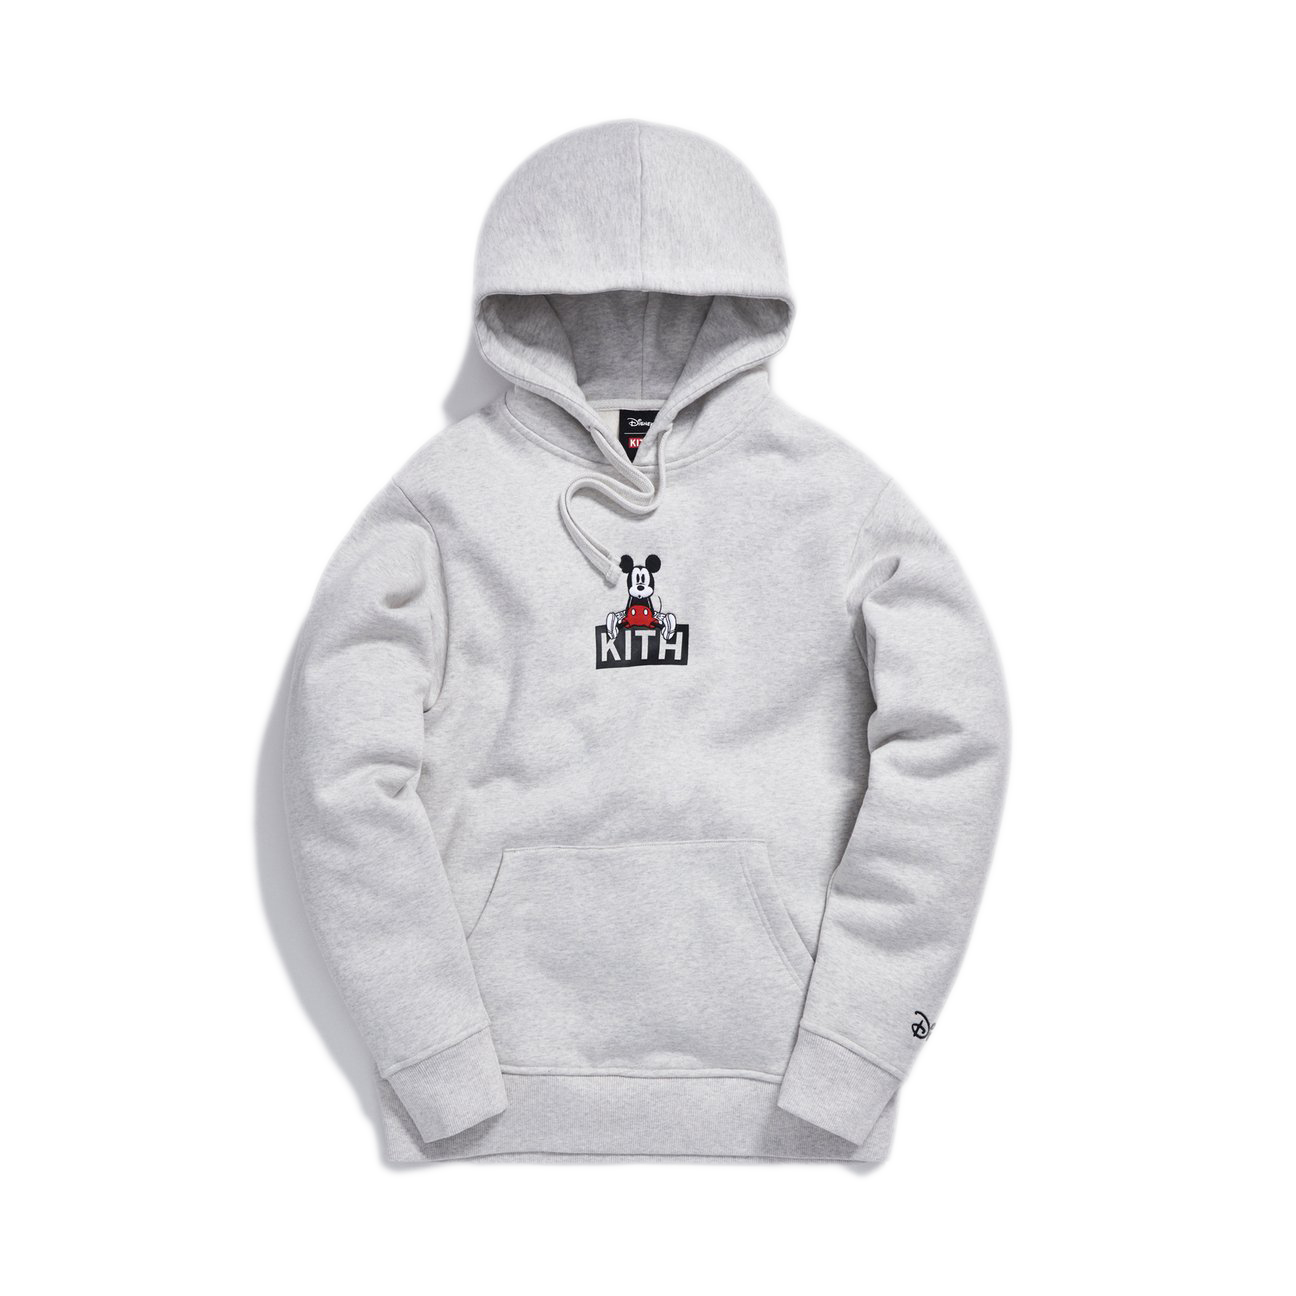 kith x nike hoodie